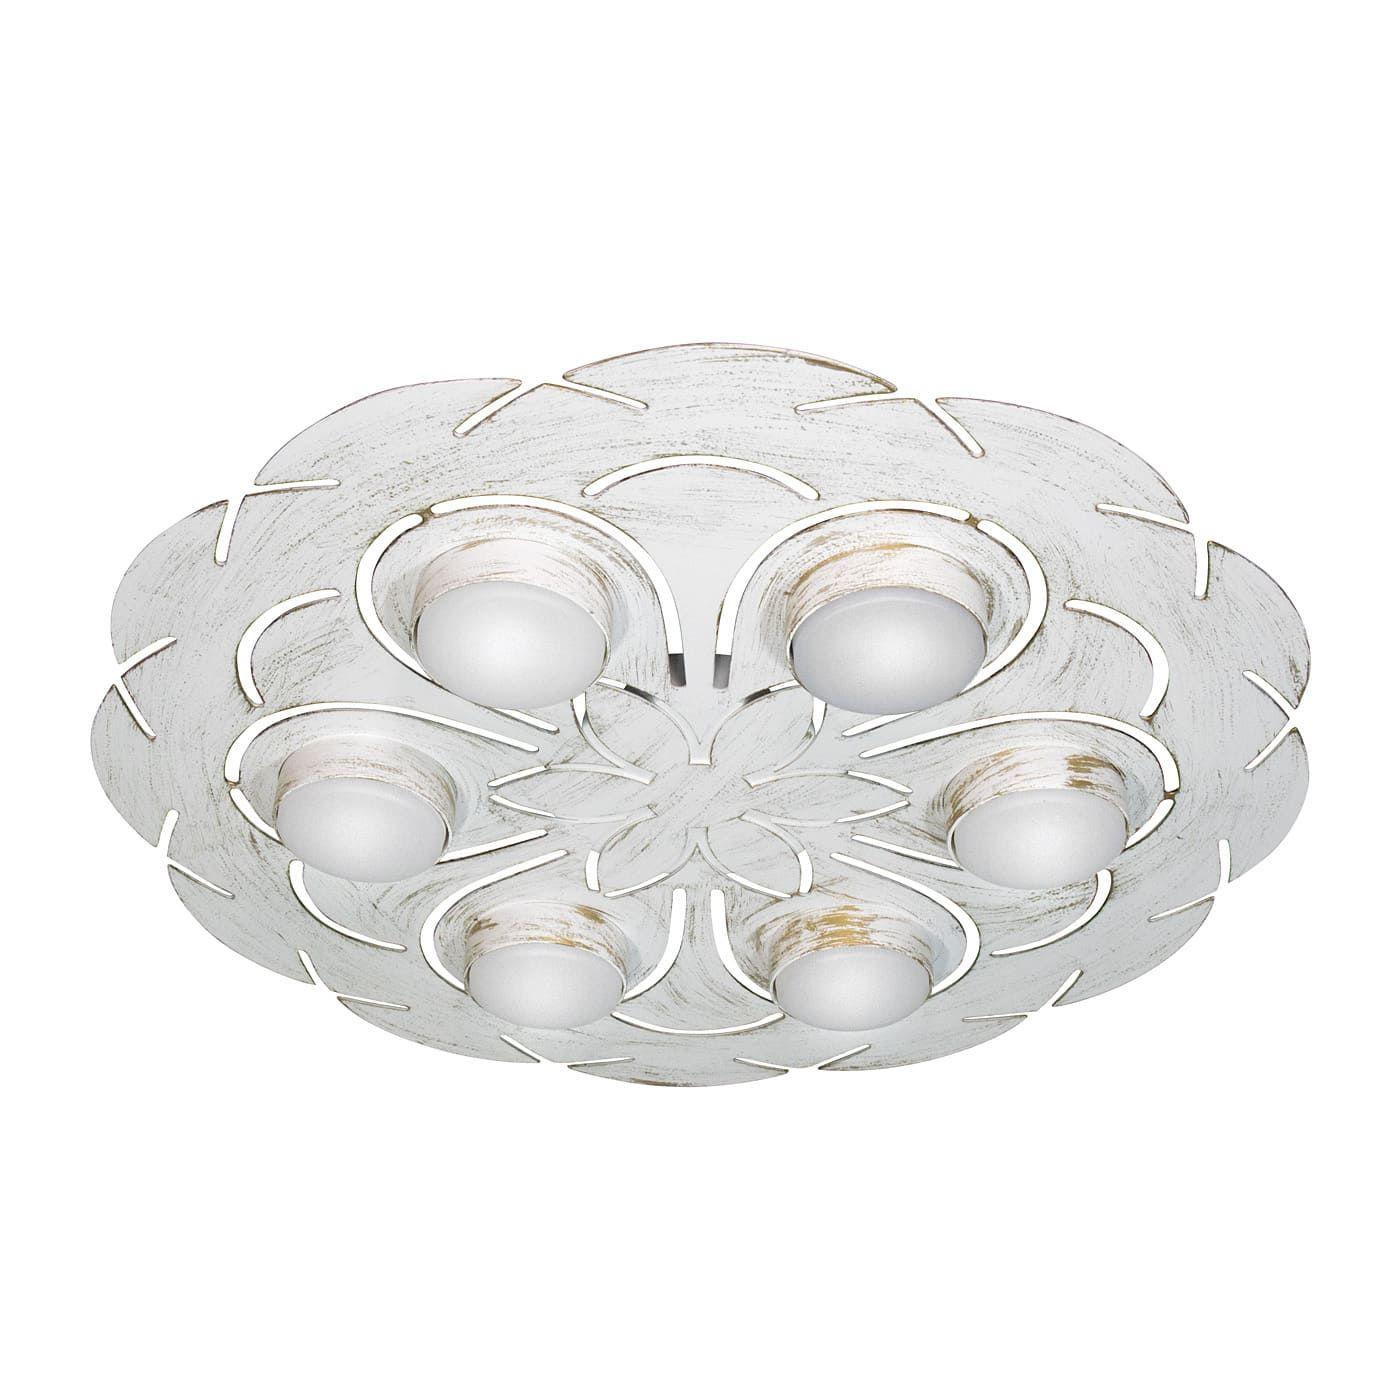 PETRASVET / Ceiling chandelier S2377-6, 6xGX53